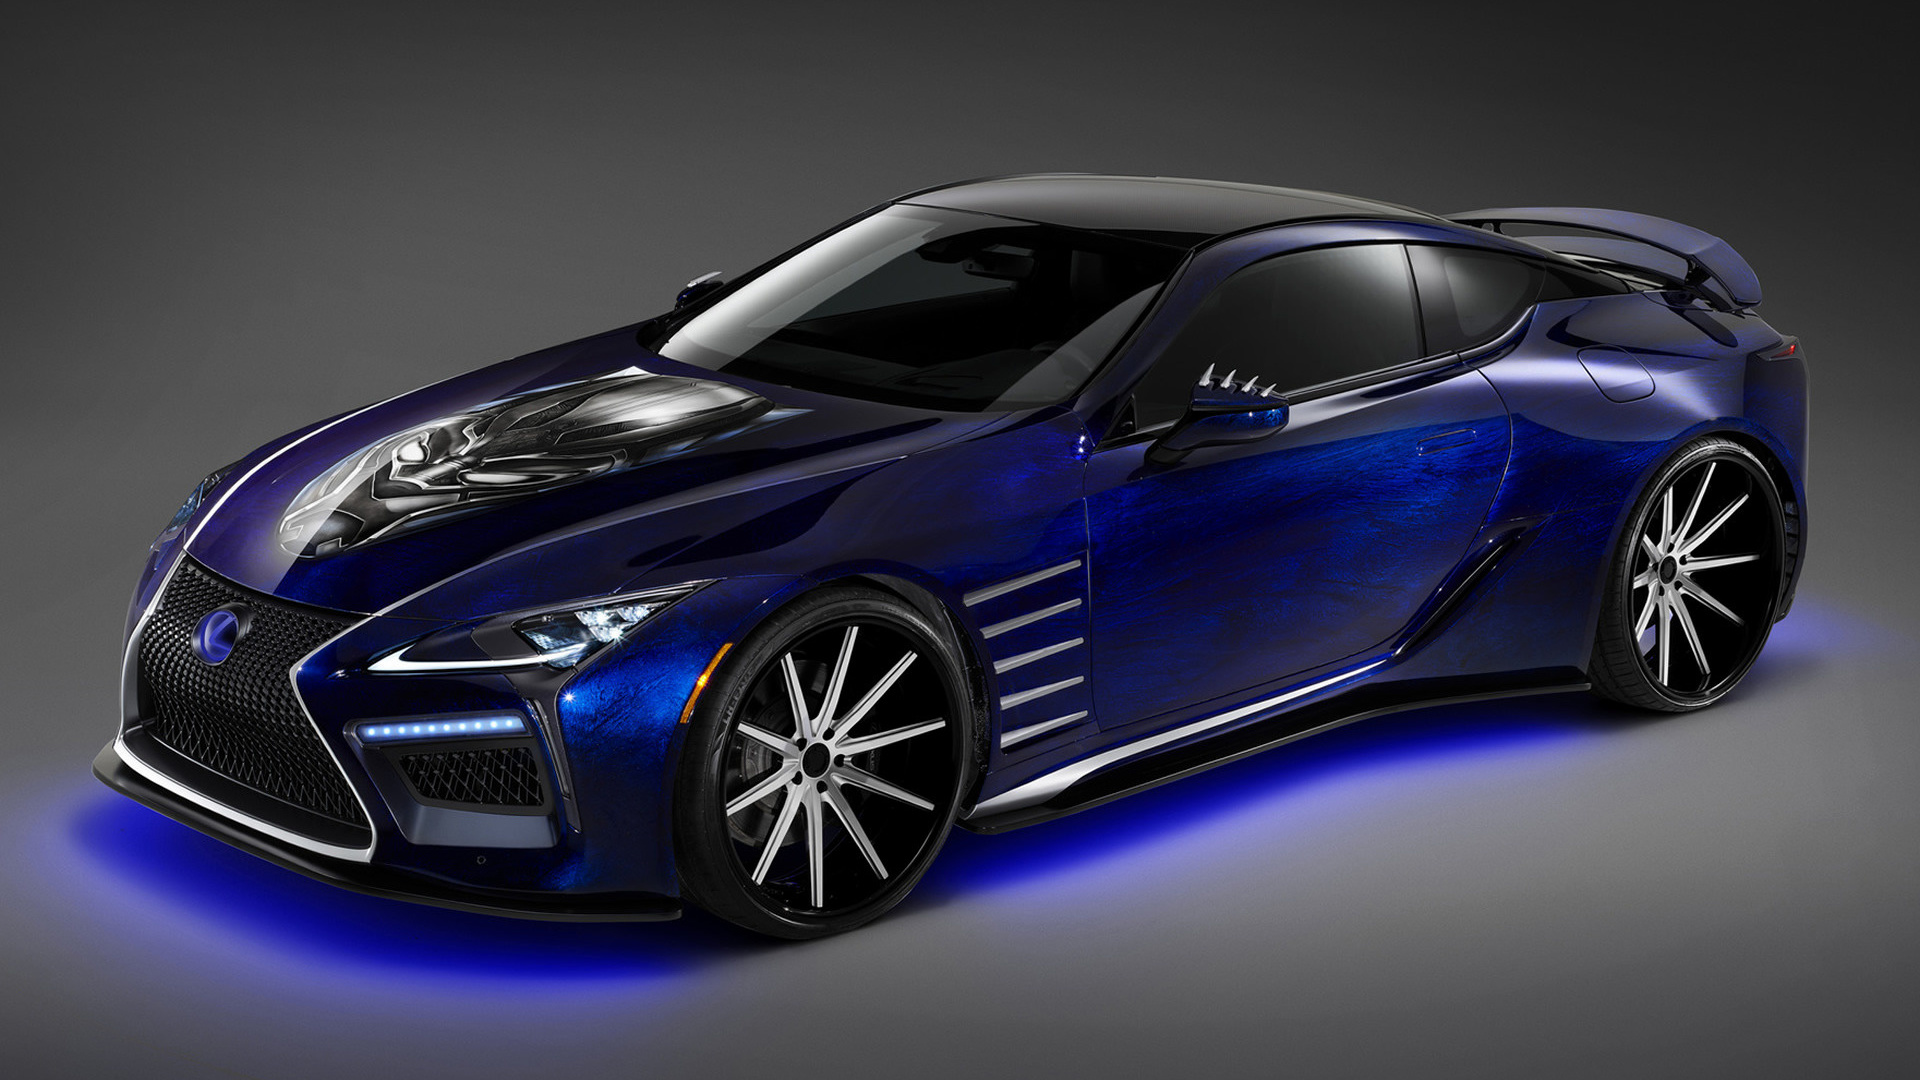 2017 Lexus Lc Inspired By Black Panther Fondos De Pantalla